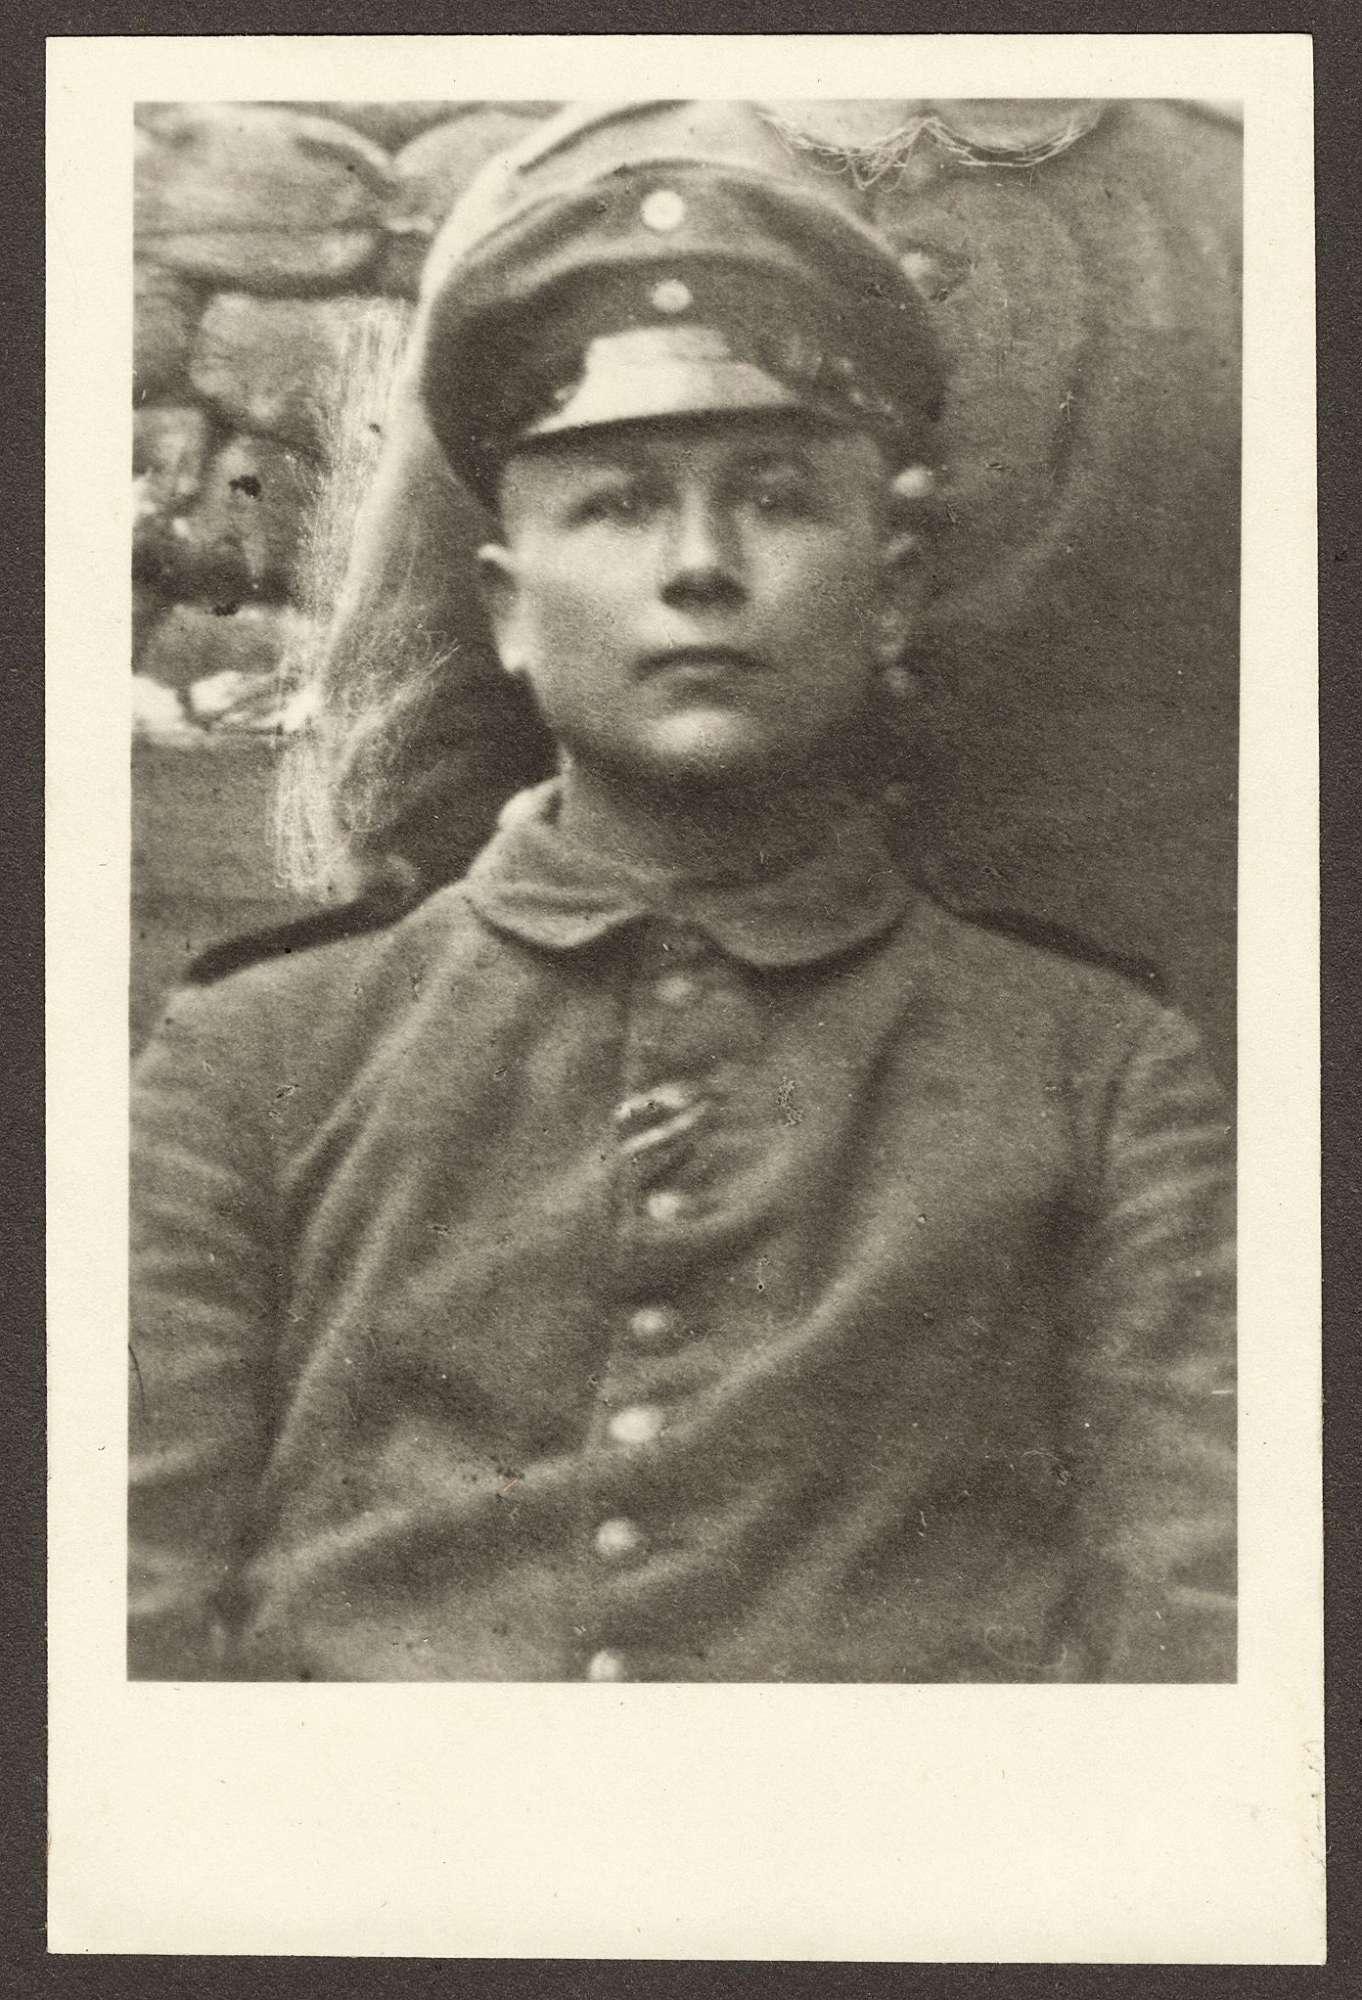 Hudelmaier, Hermann, Bild 1